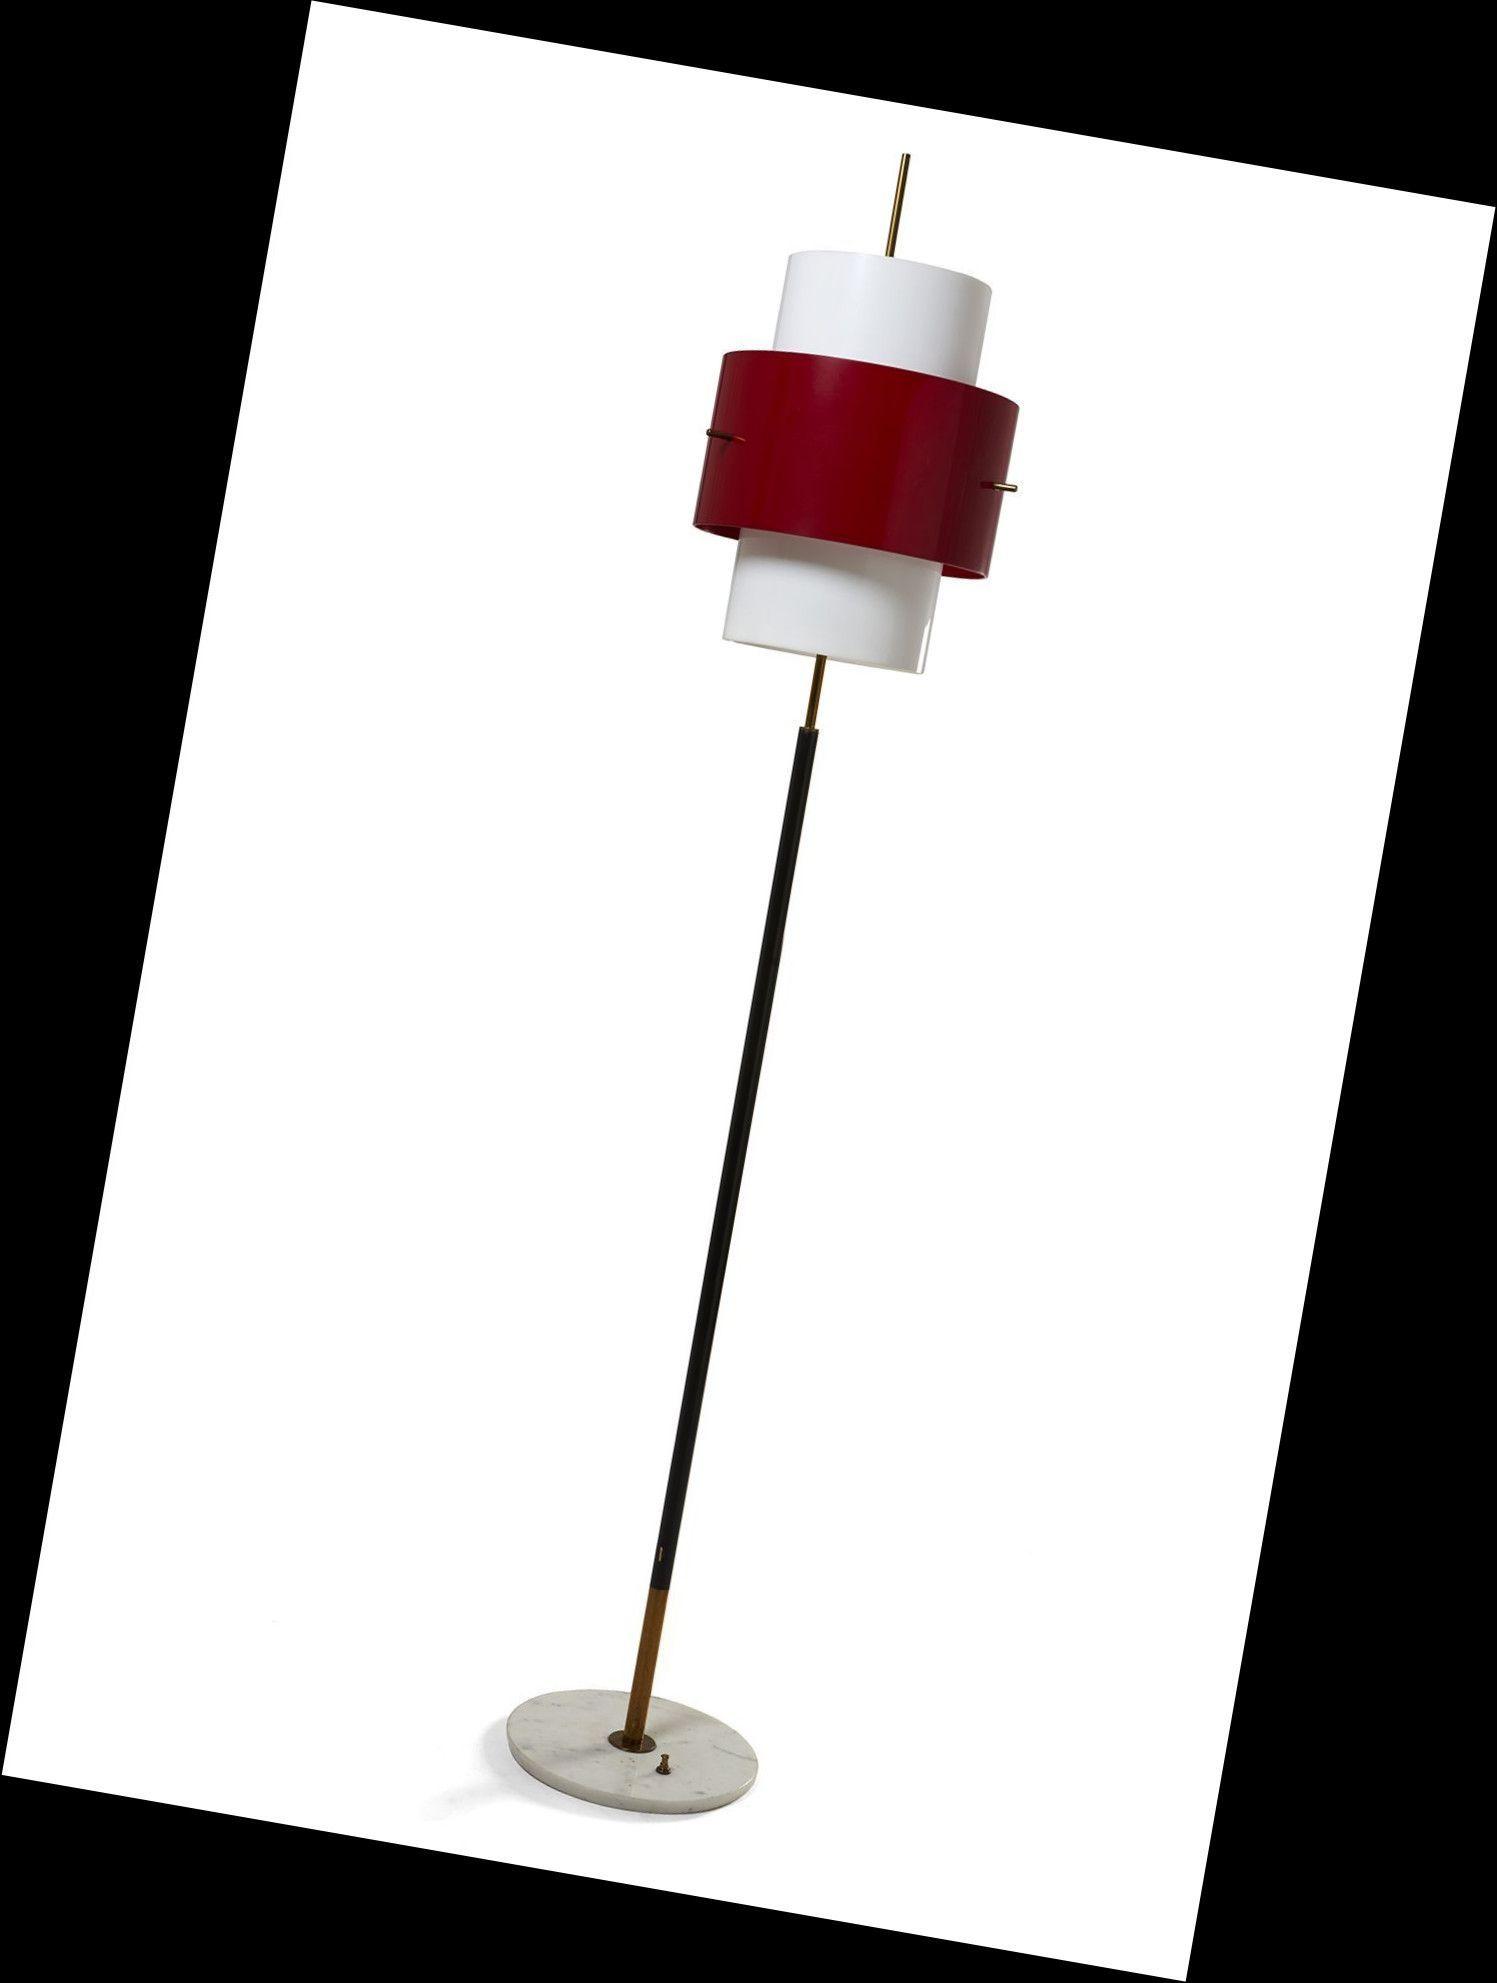 Chaise Longue Castorama Inspirant Pin On Conception De Jardin Of 25 Luxe Chaise Longue Castorama